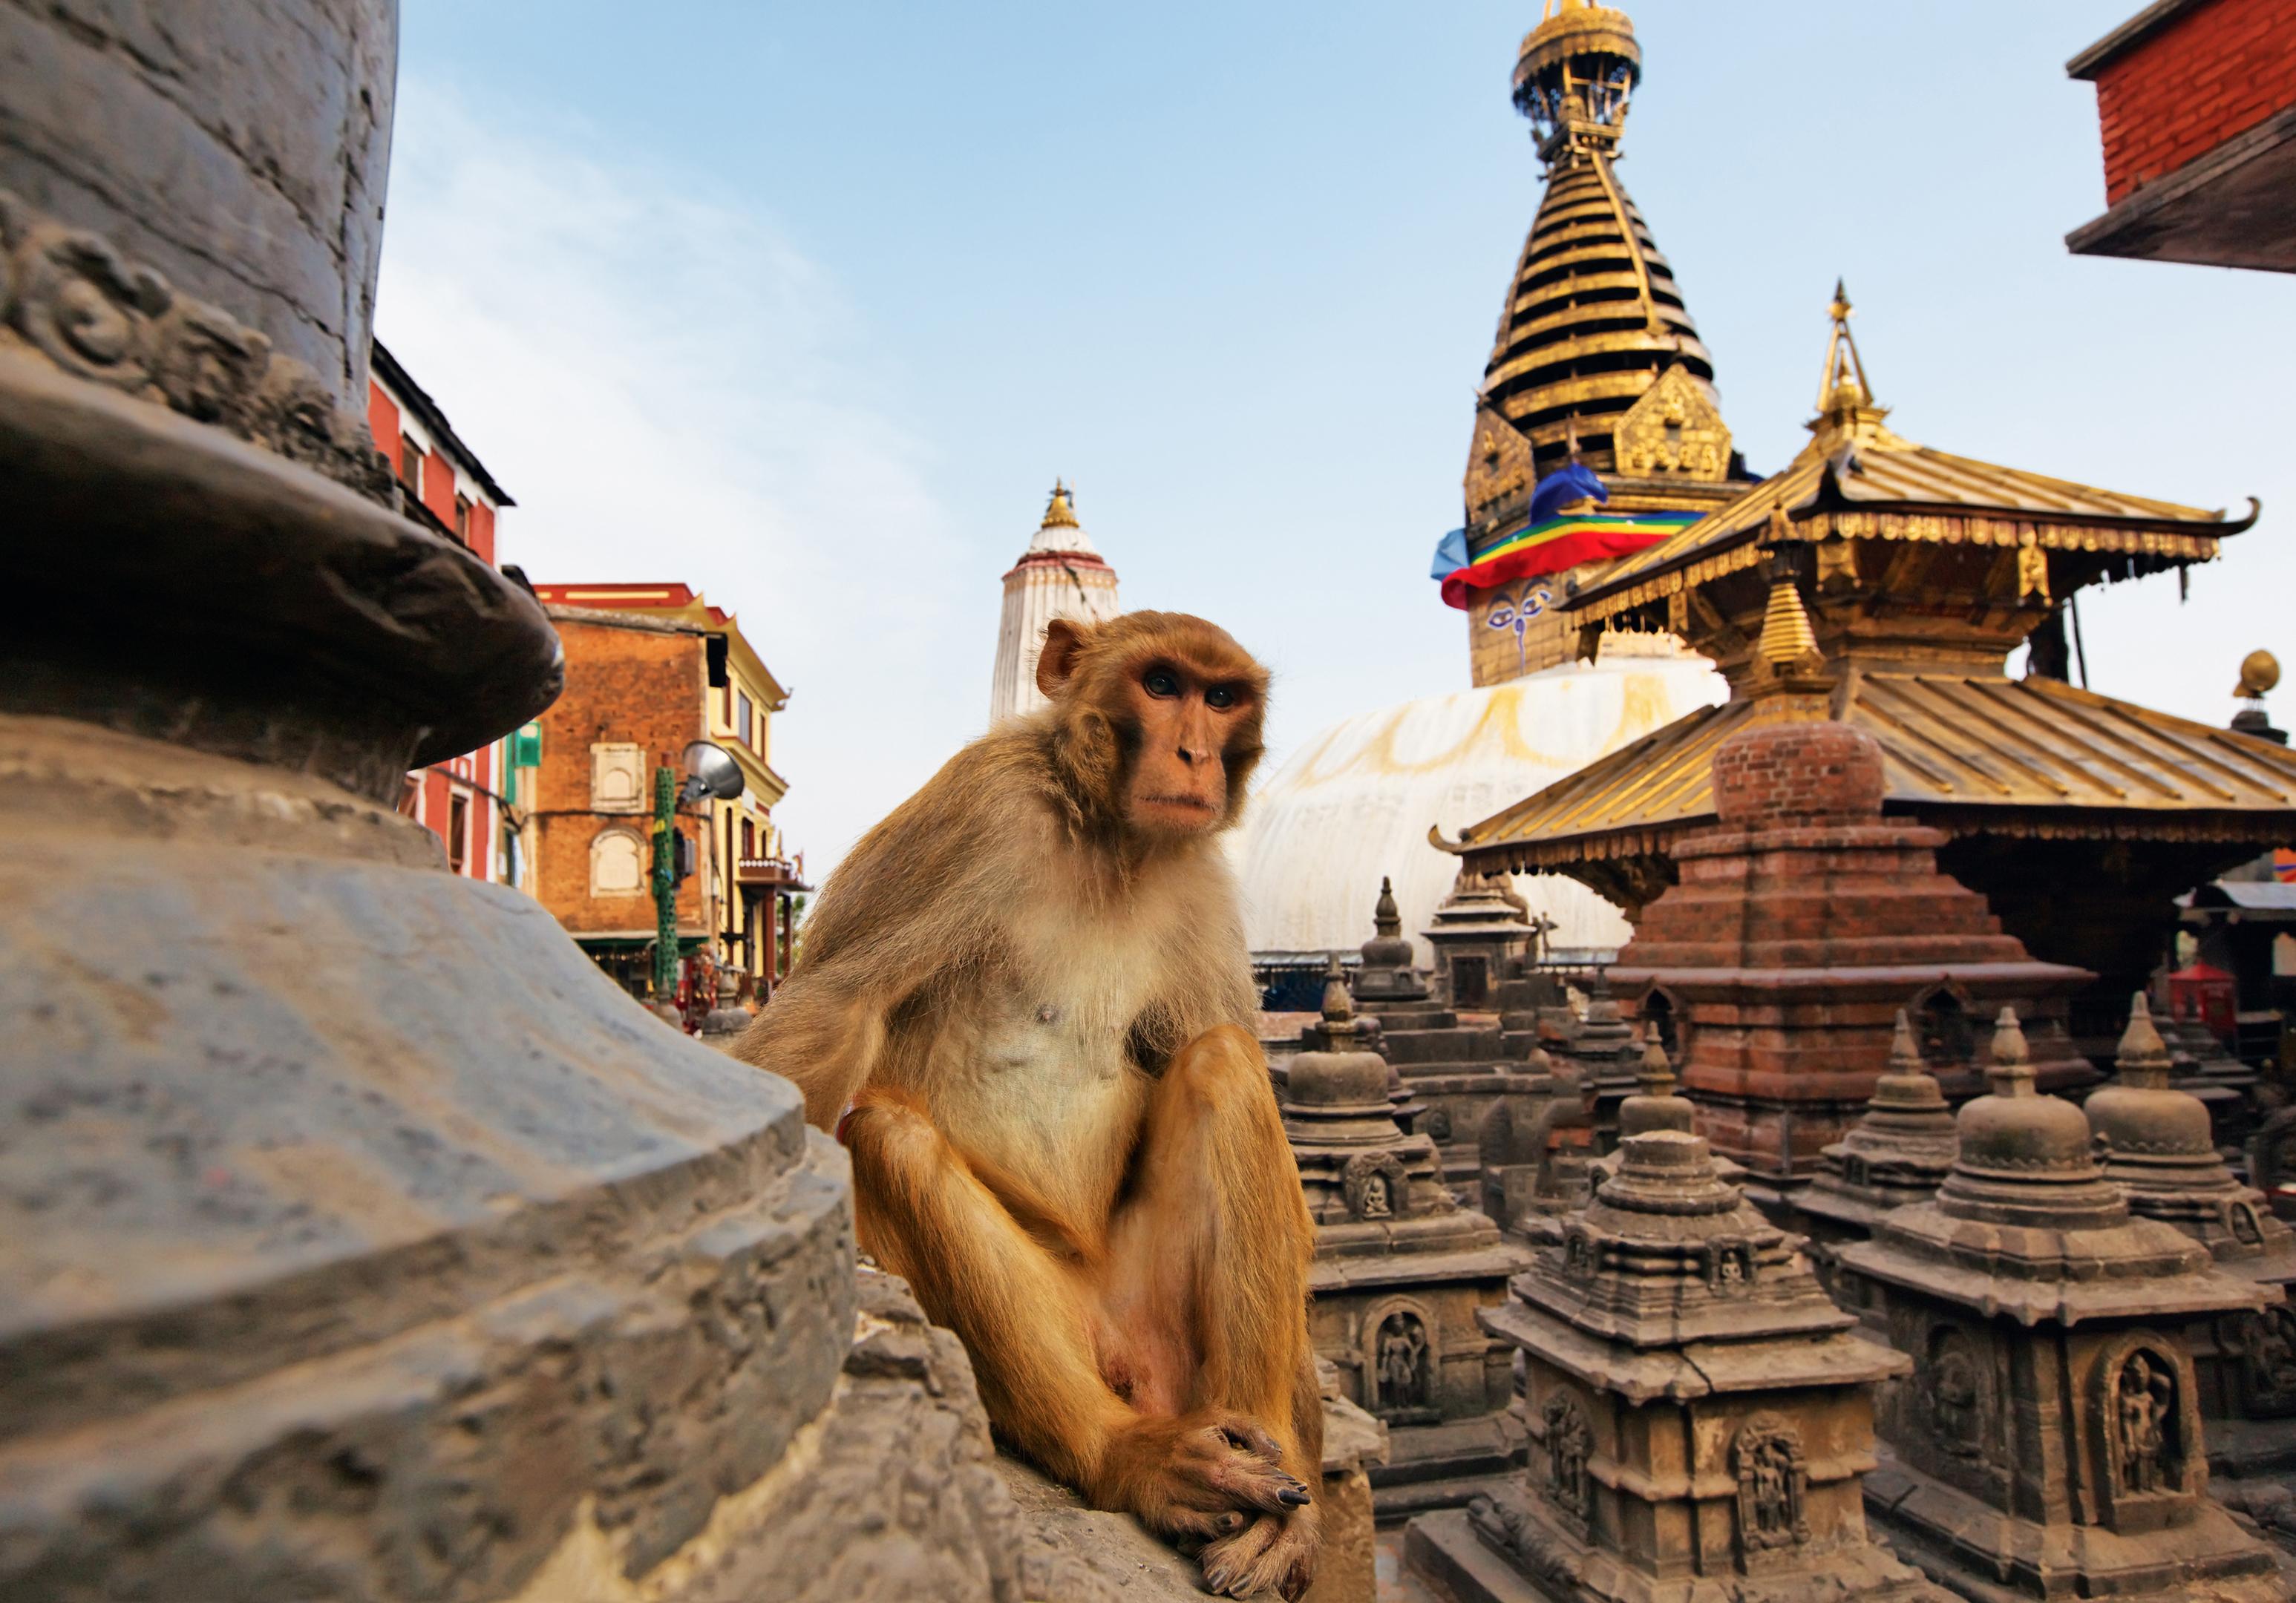 Sitting monkey on swayambhunath stupa in Kathmandu, Nepal (iStock)